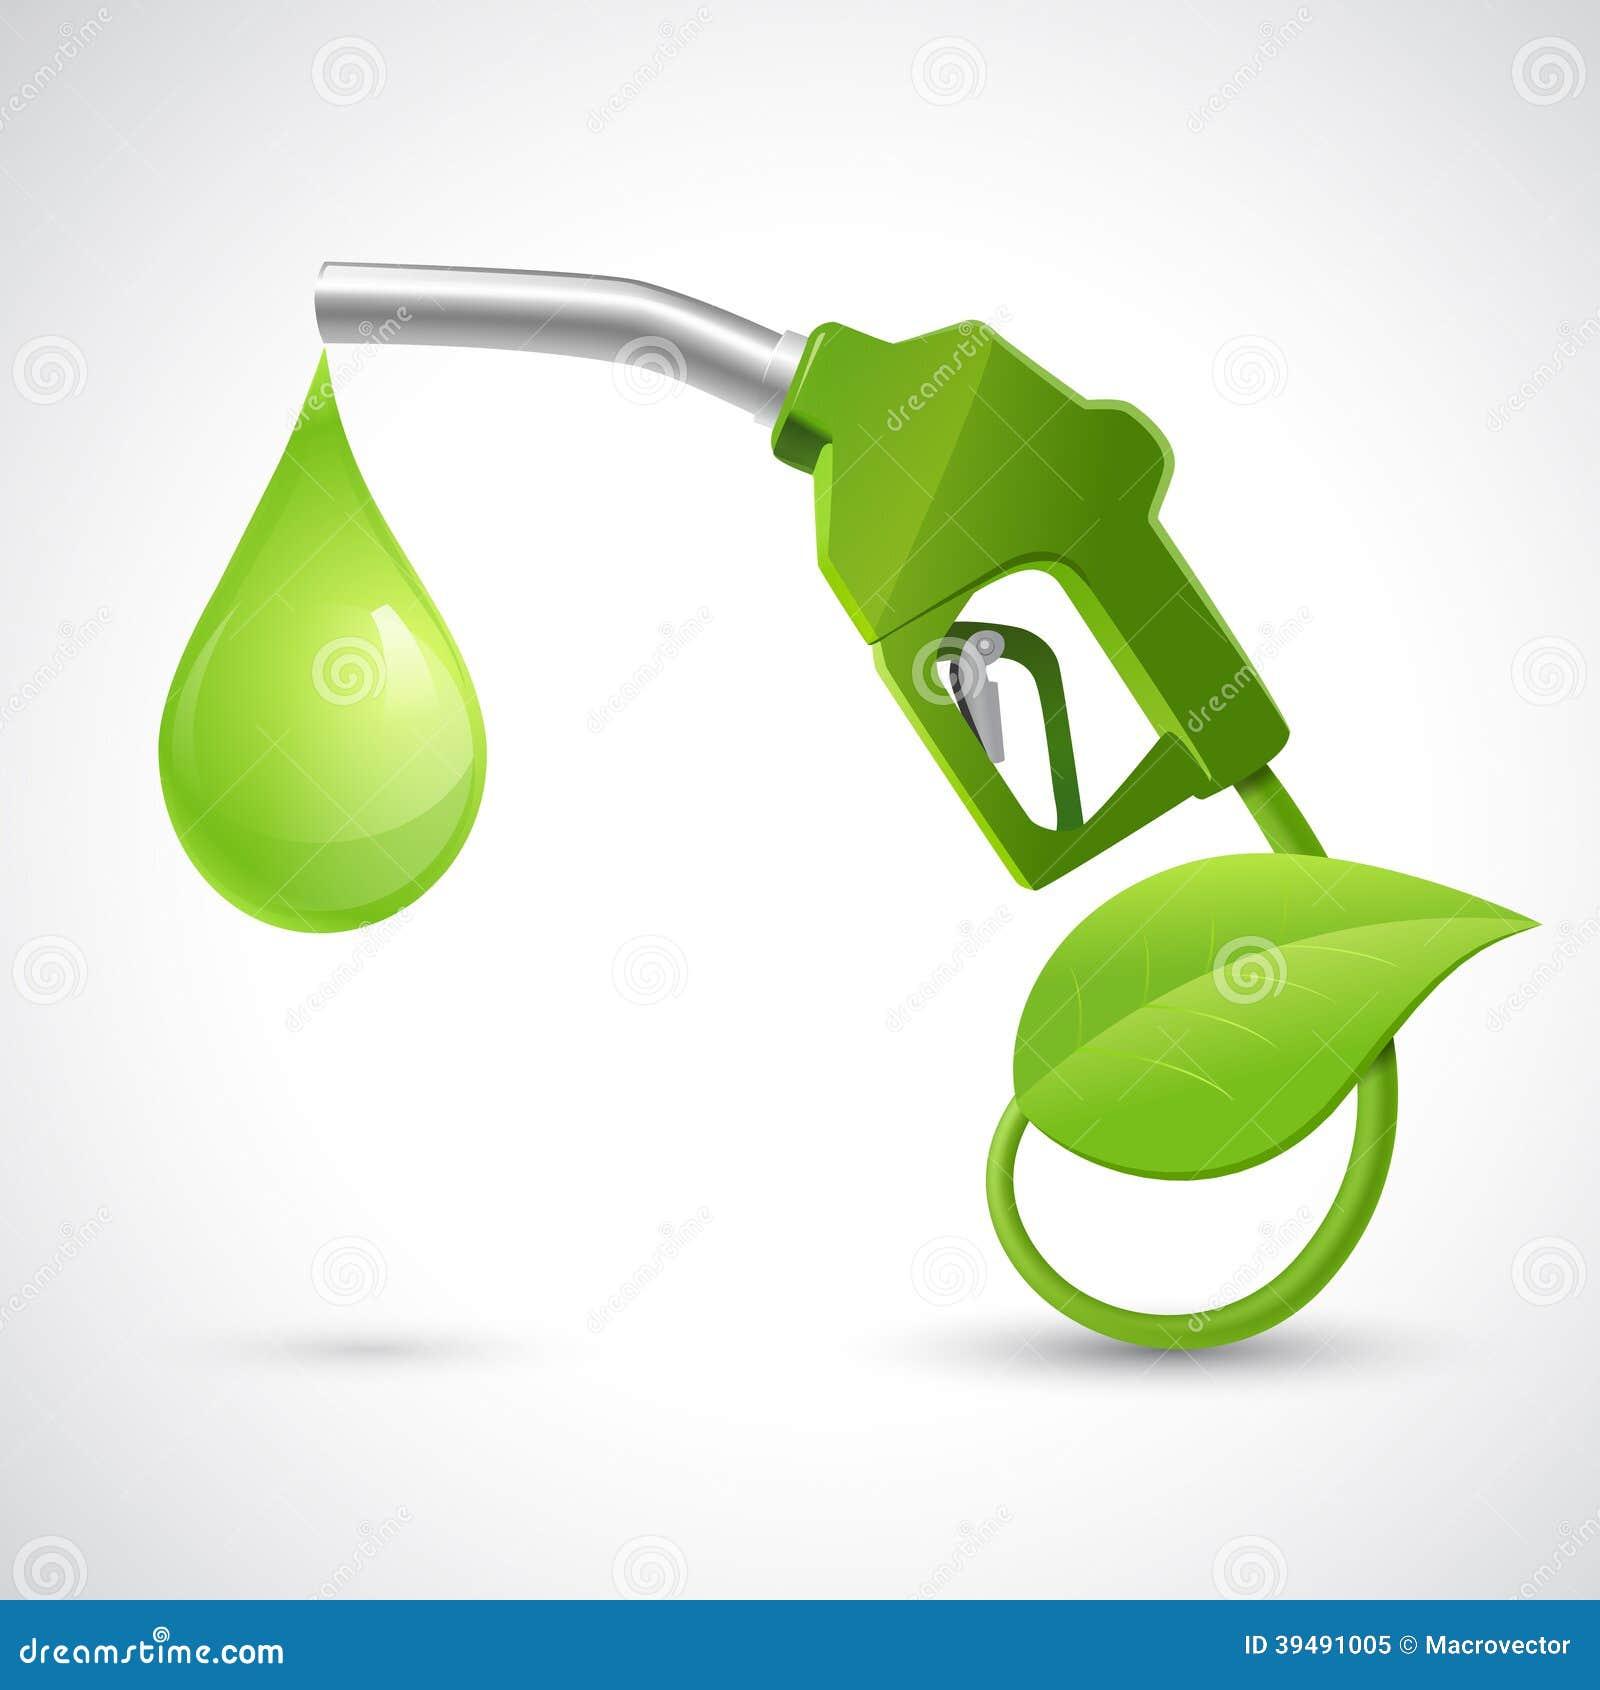 Fuel consumption label